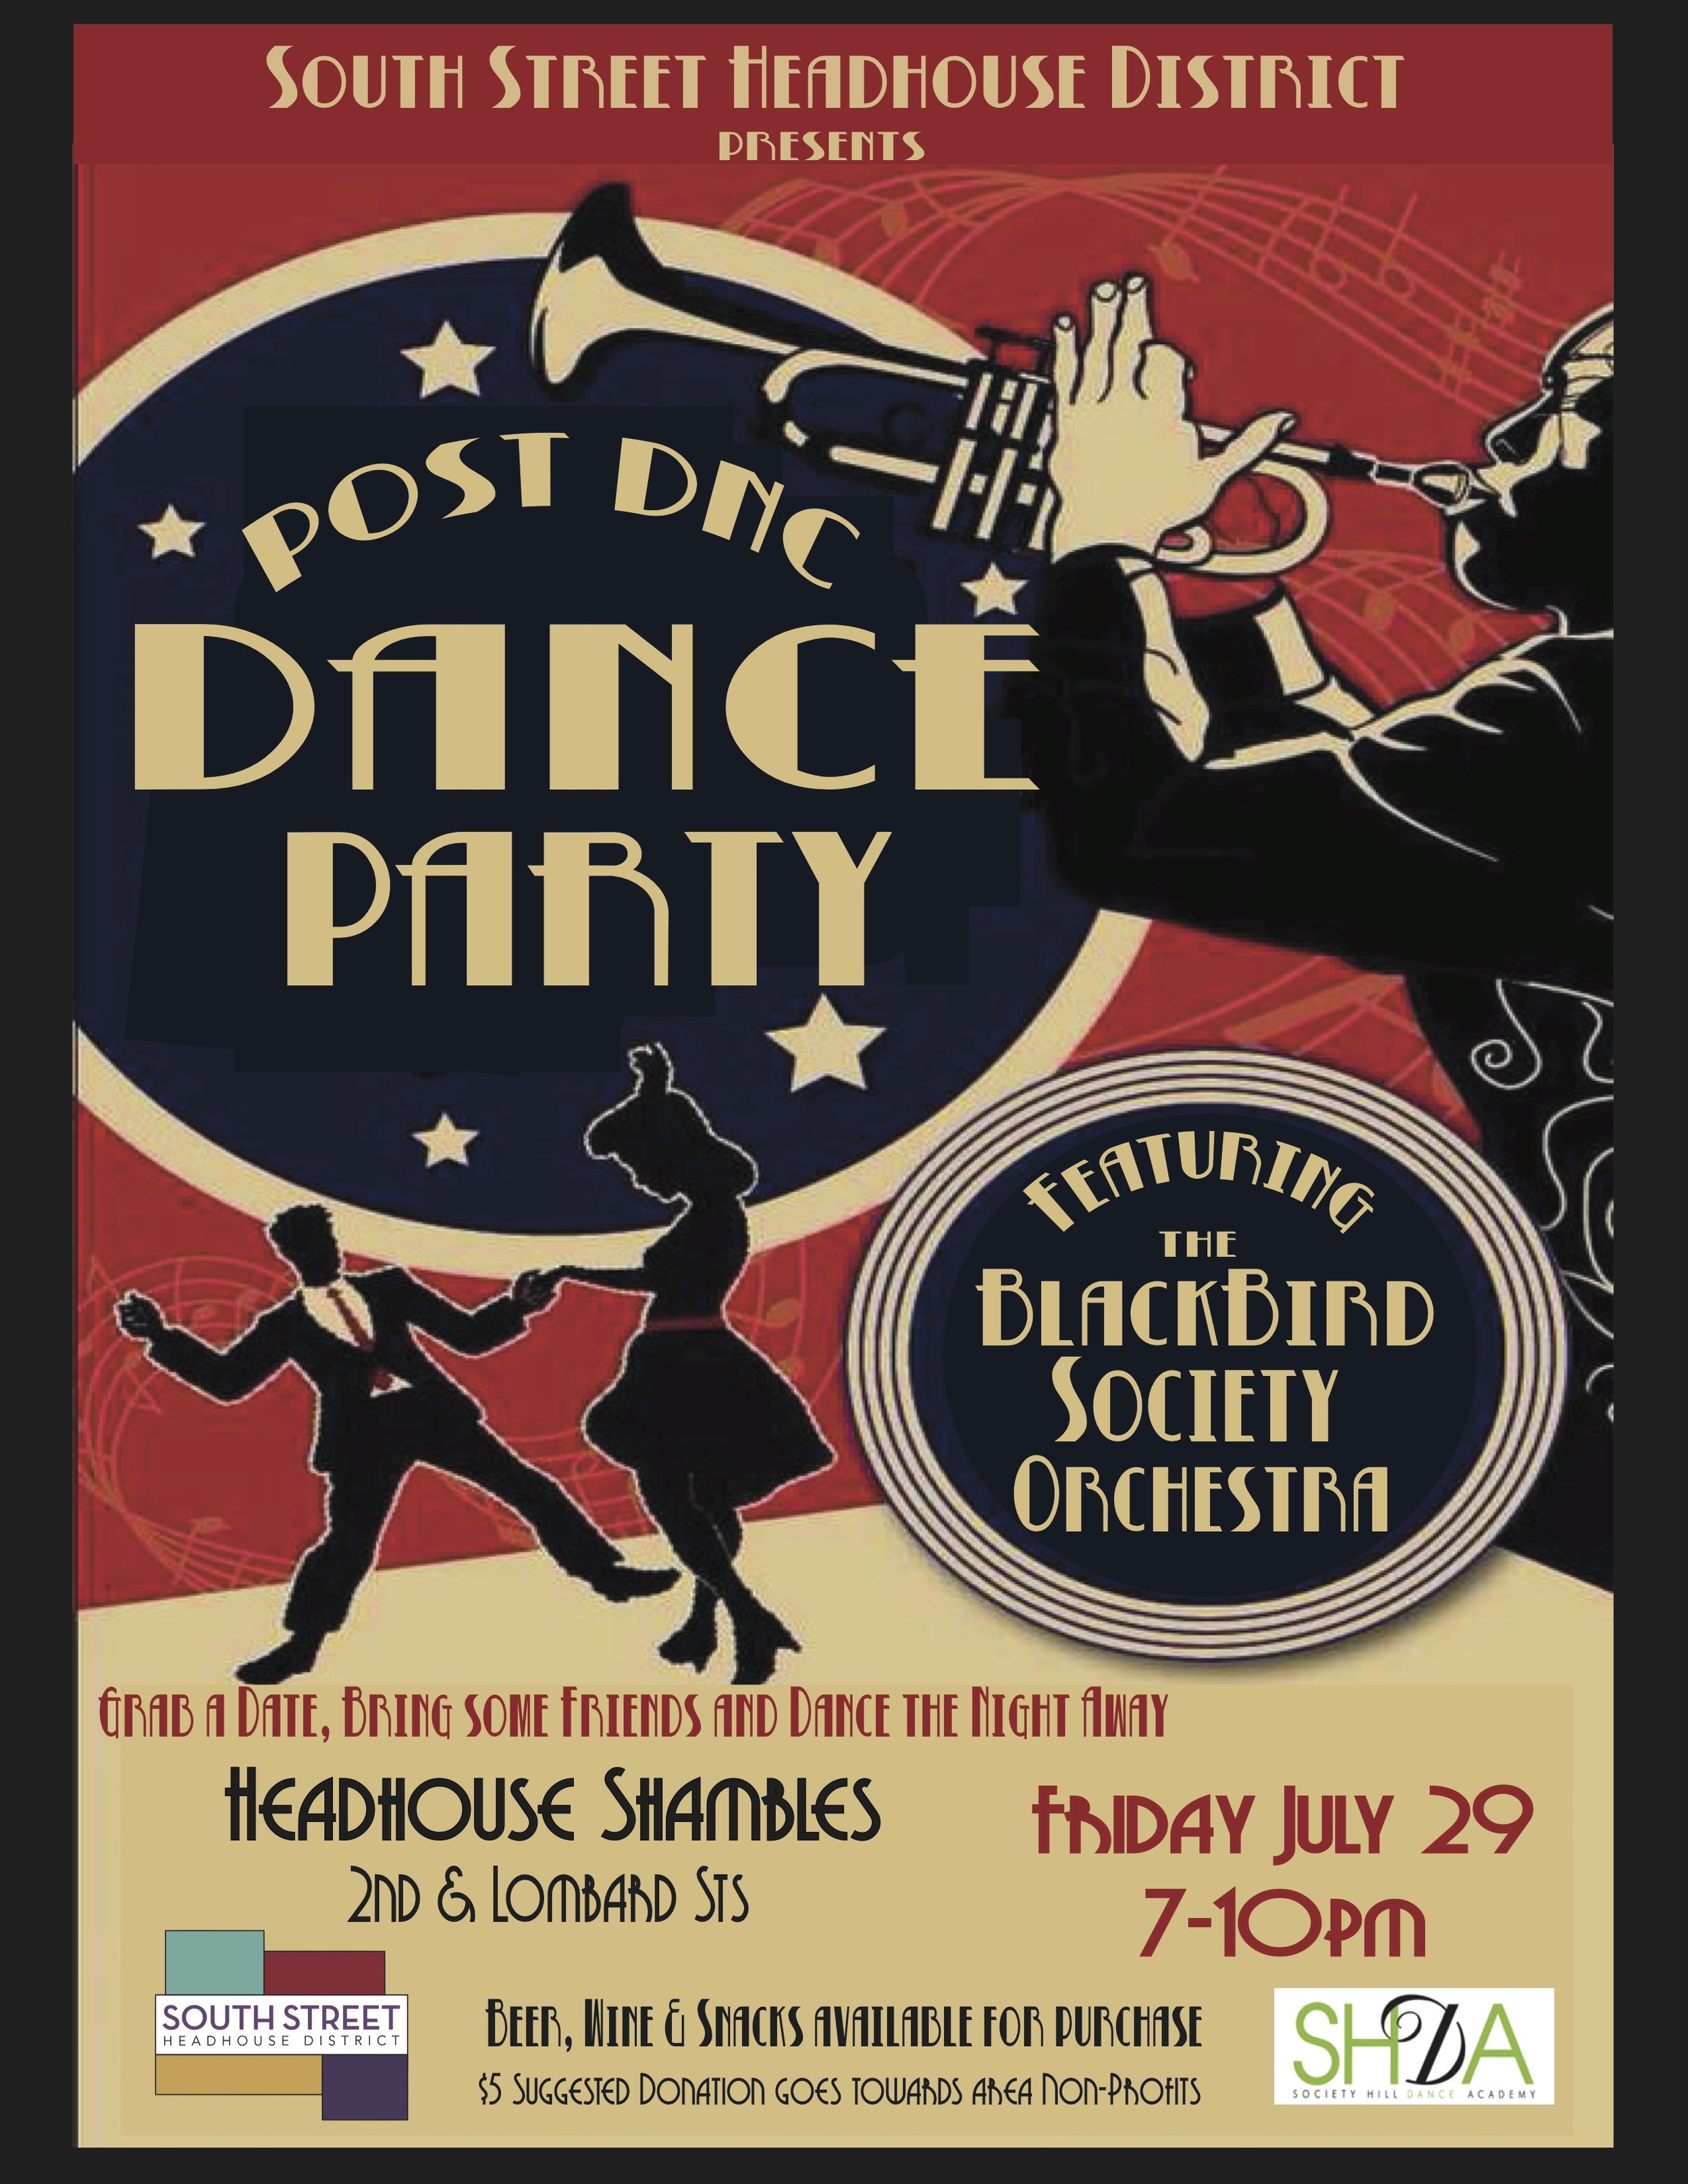 dance party, Democratic National Convention, DNC, Philadelphia, South Street